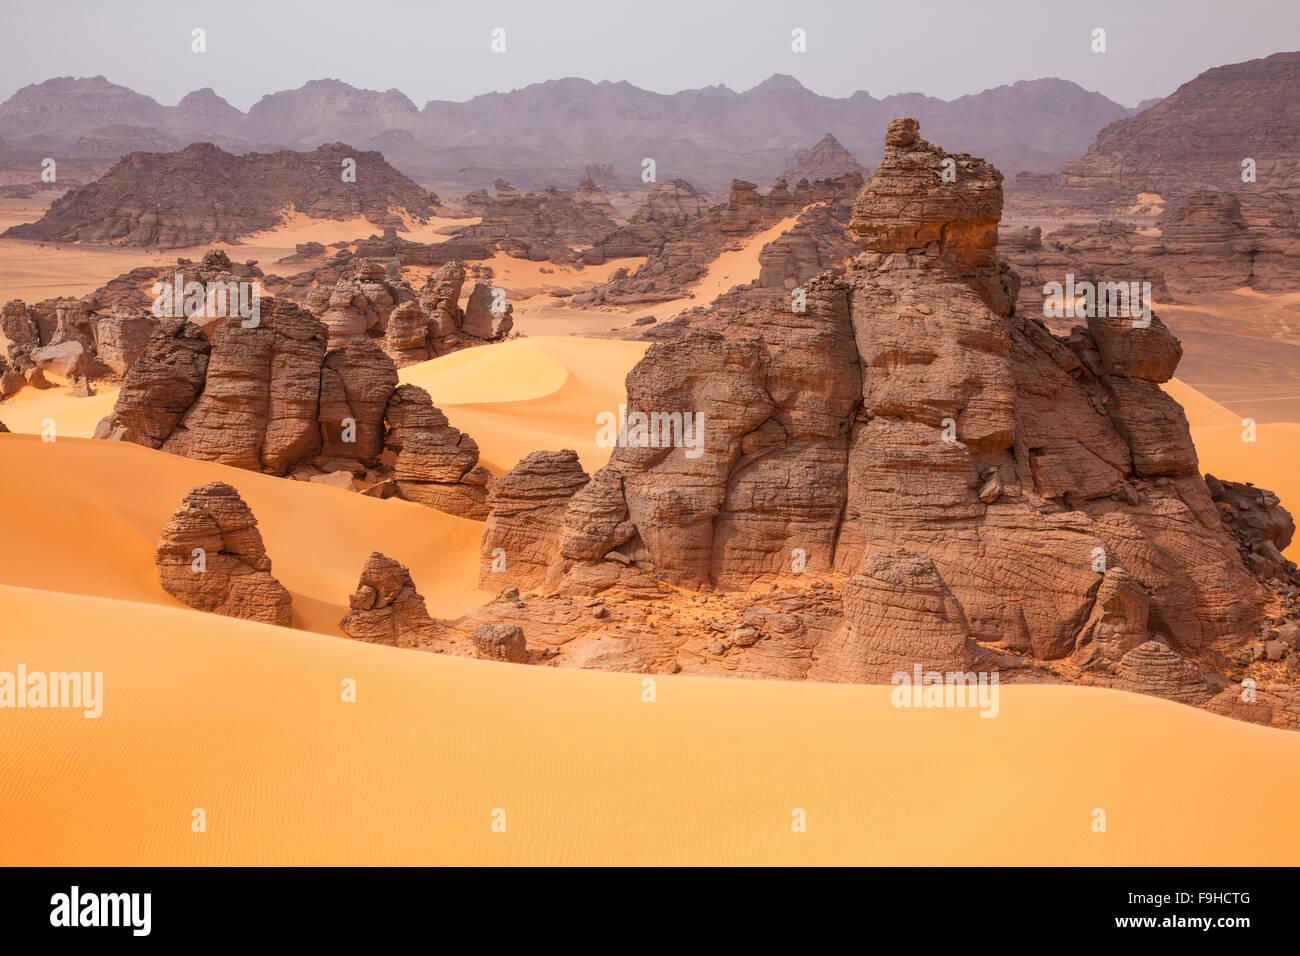 Sandstone and dunes, Jebel Acacus, LIbya, Mountains in Sahara Desert UNESCO World Heritage Site, The Awiss - Stock Image